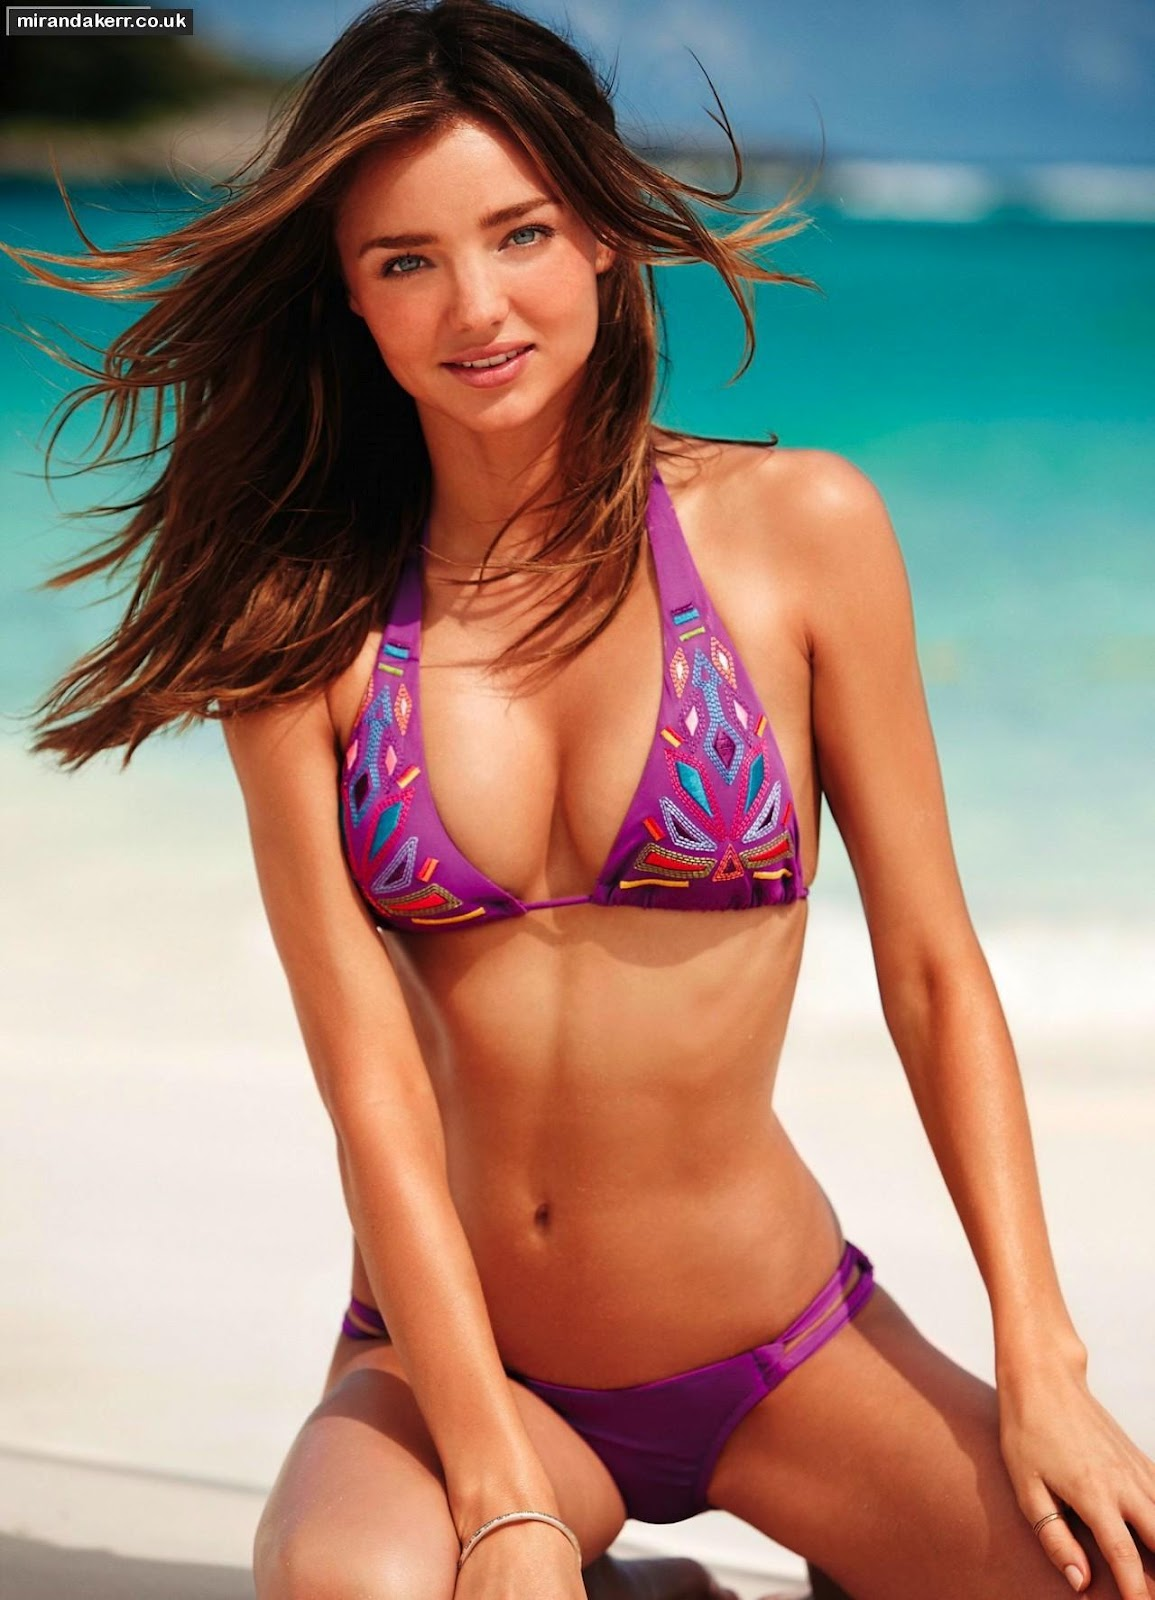 http://2.bp.blogspot.com/-X1Q71sf2Rk8/UBxKY-wts_I/AAAAAAAAINc/wSFDmyK4RuA/s1600/Miranda+Kerr+Bikini+%25284%2529.jpg